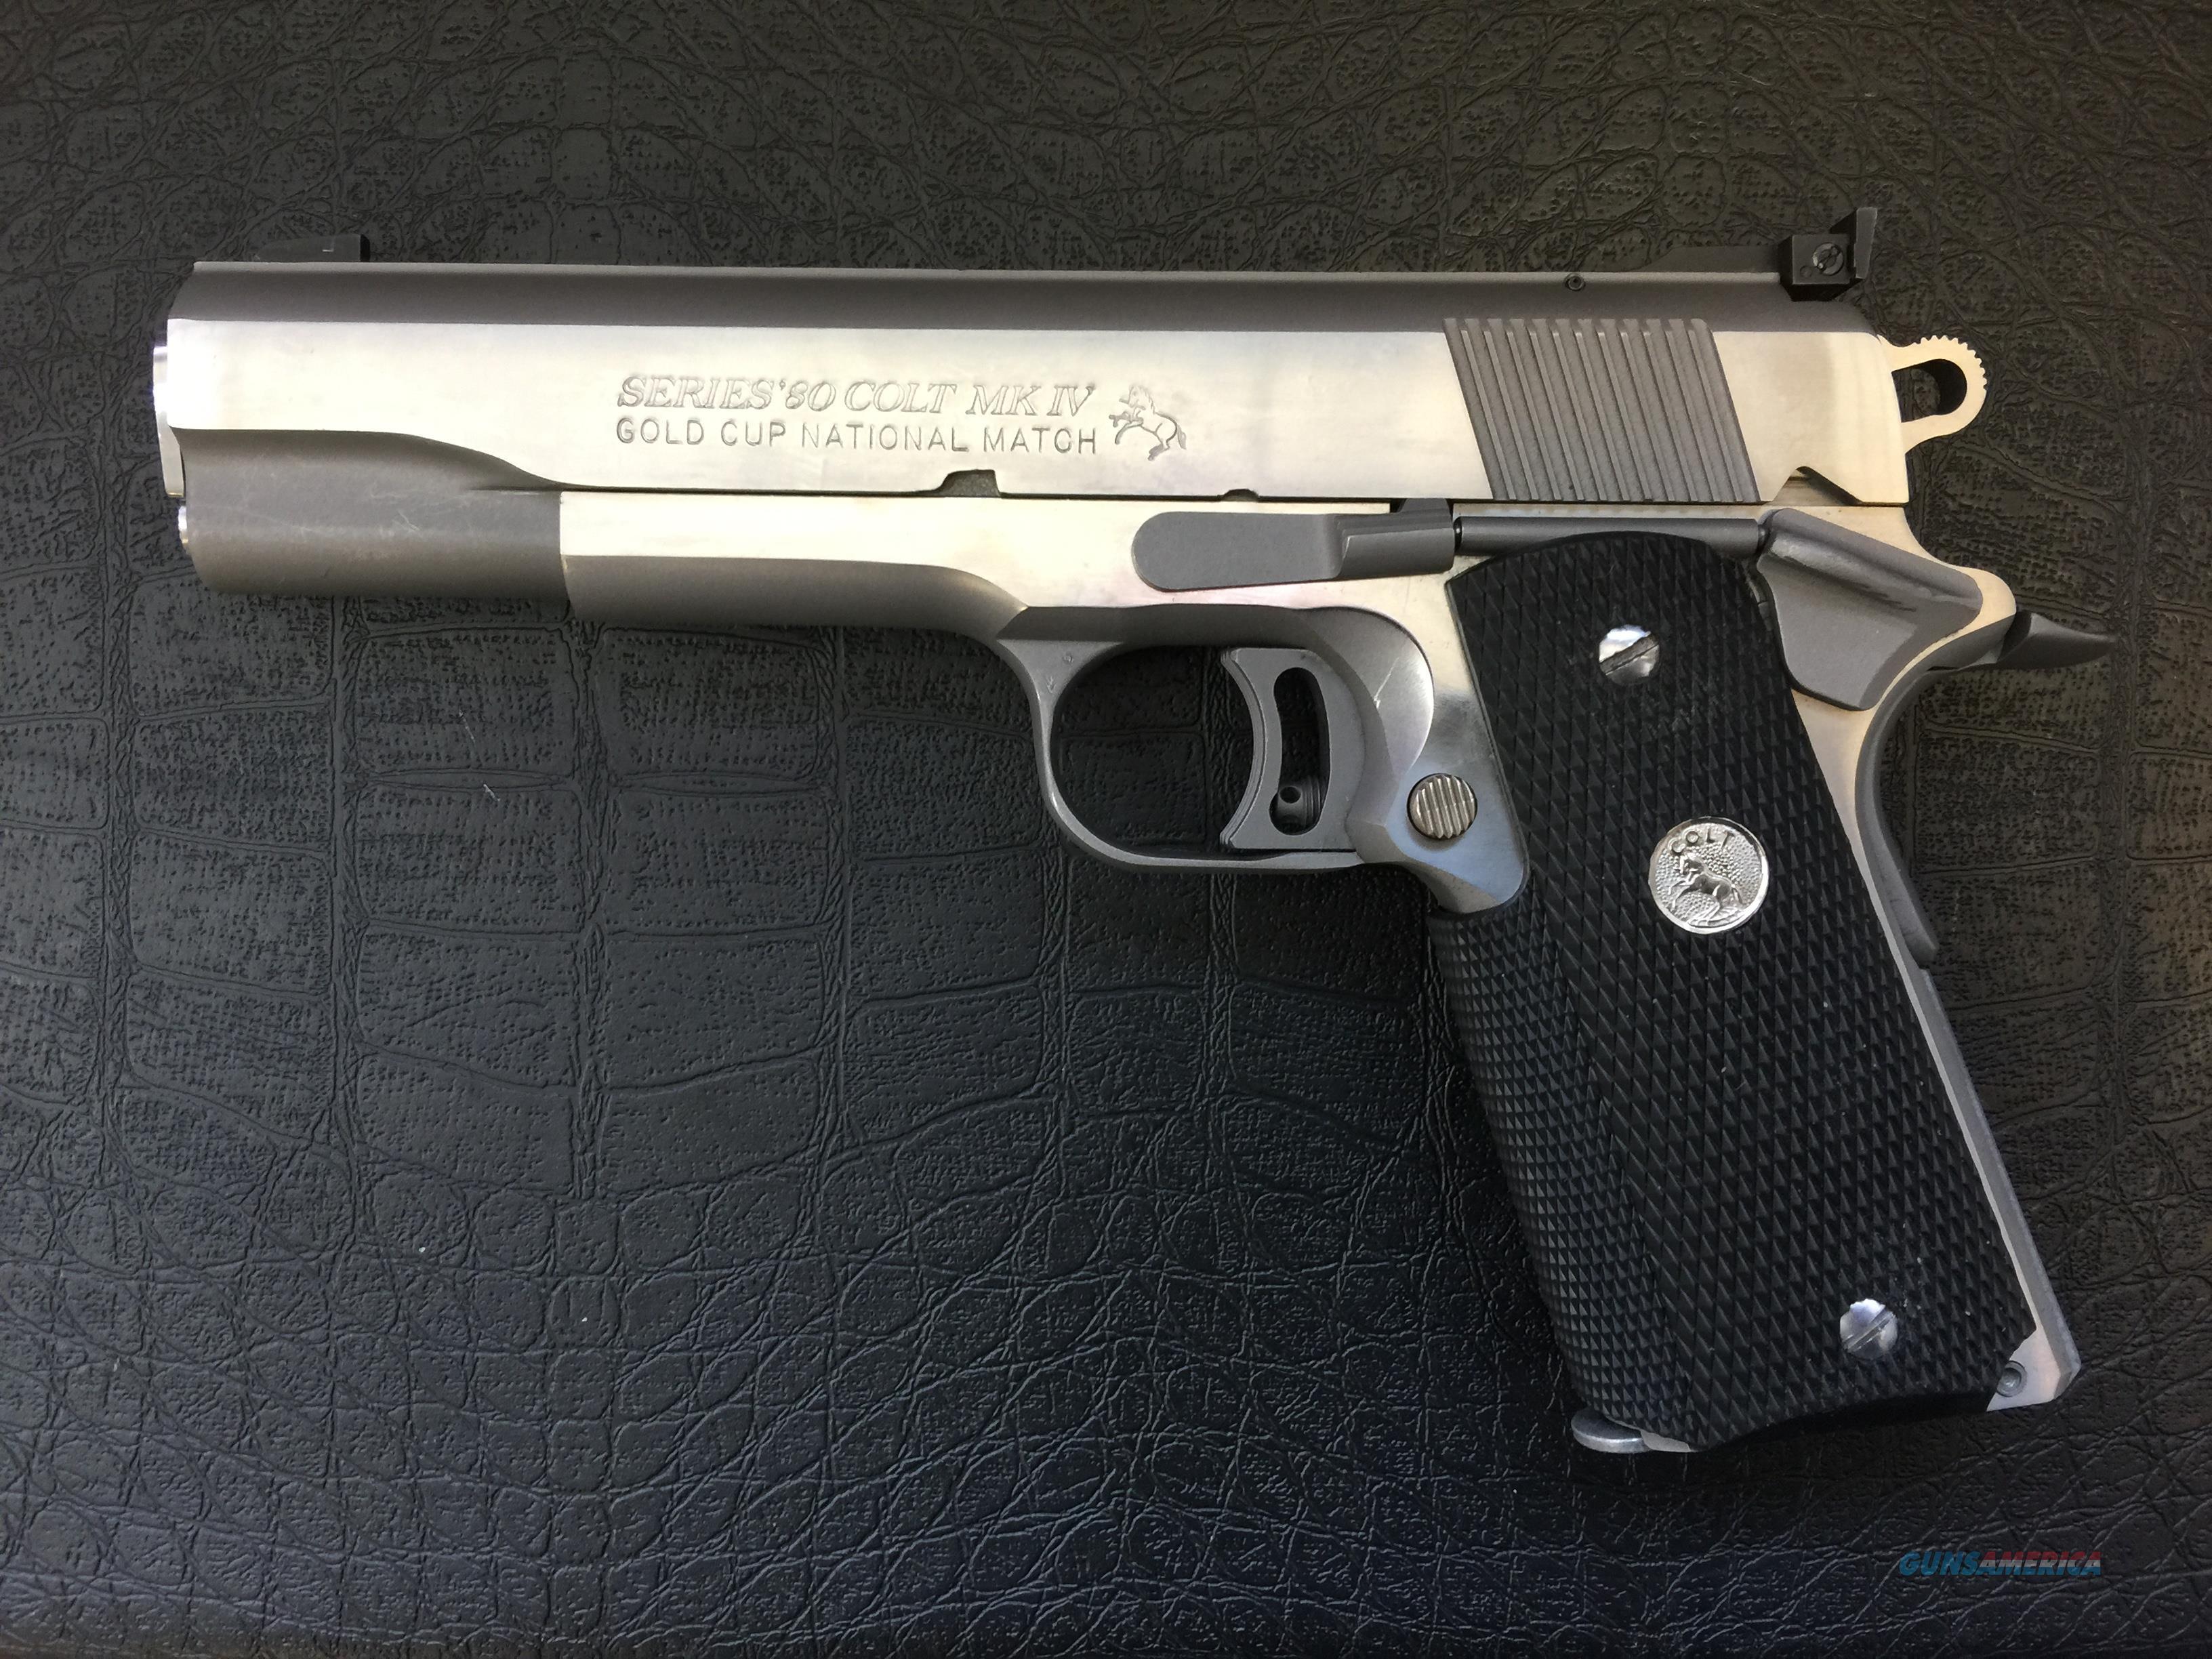 Colt Series 80 MkIV GOLD CUP NATIONAL MATCH - semi-automatic pistol 45acp  Guns > Pistols > Colt Automatic Pistols (1911 & Var)